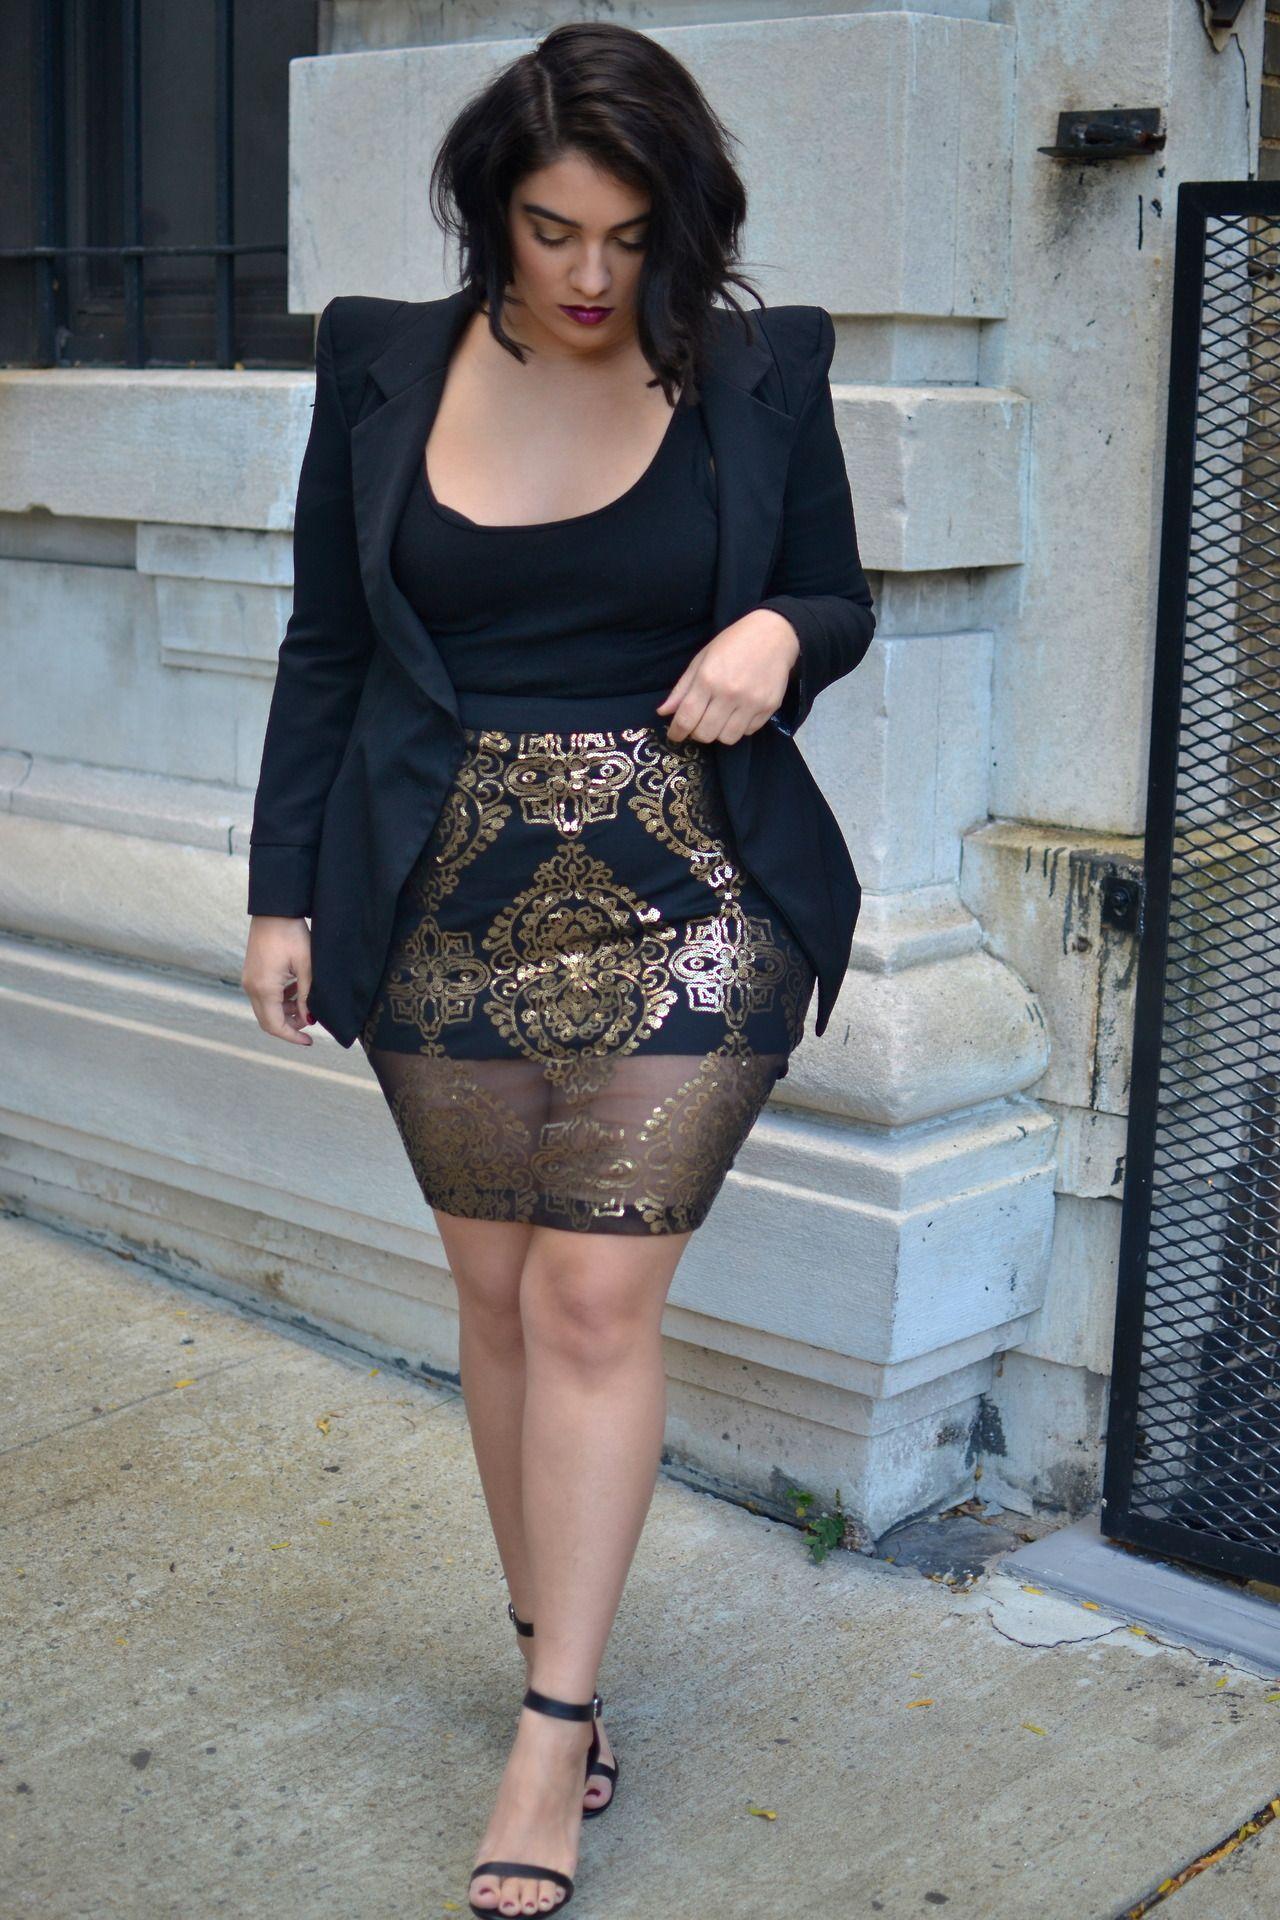 Big girl fashions online 30